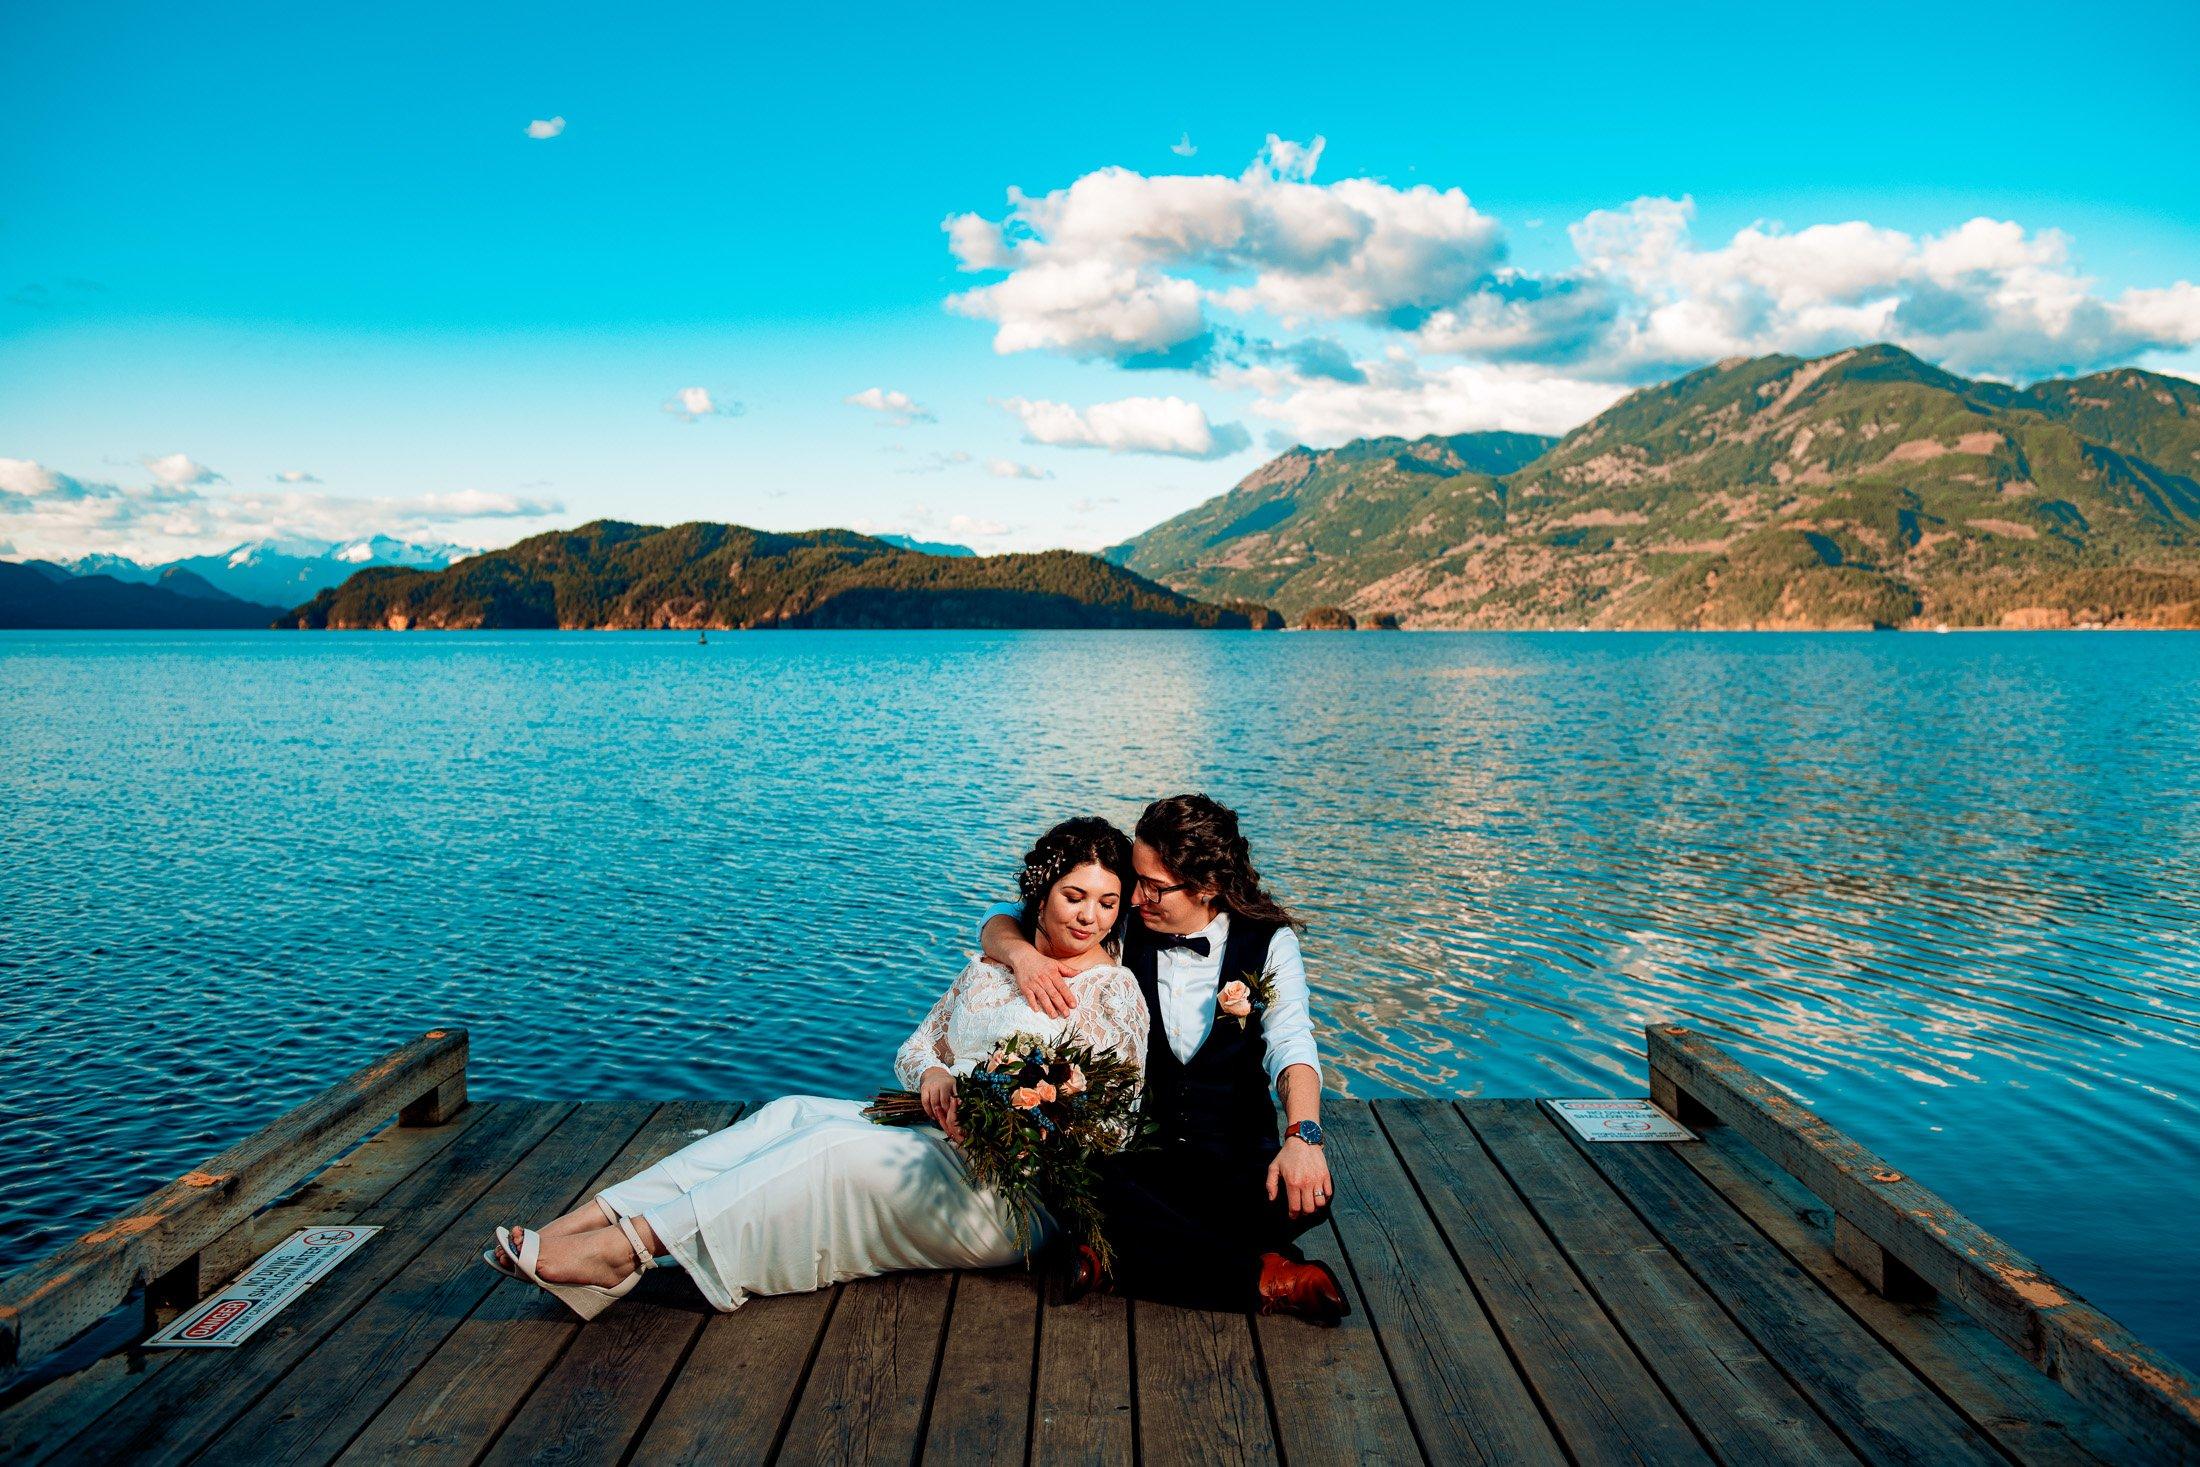 025 - wedding photos harrison hotsprings